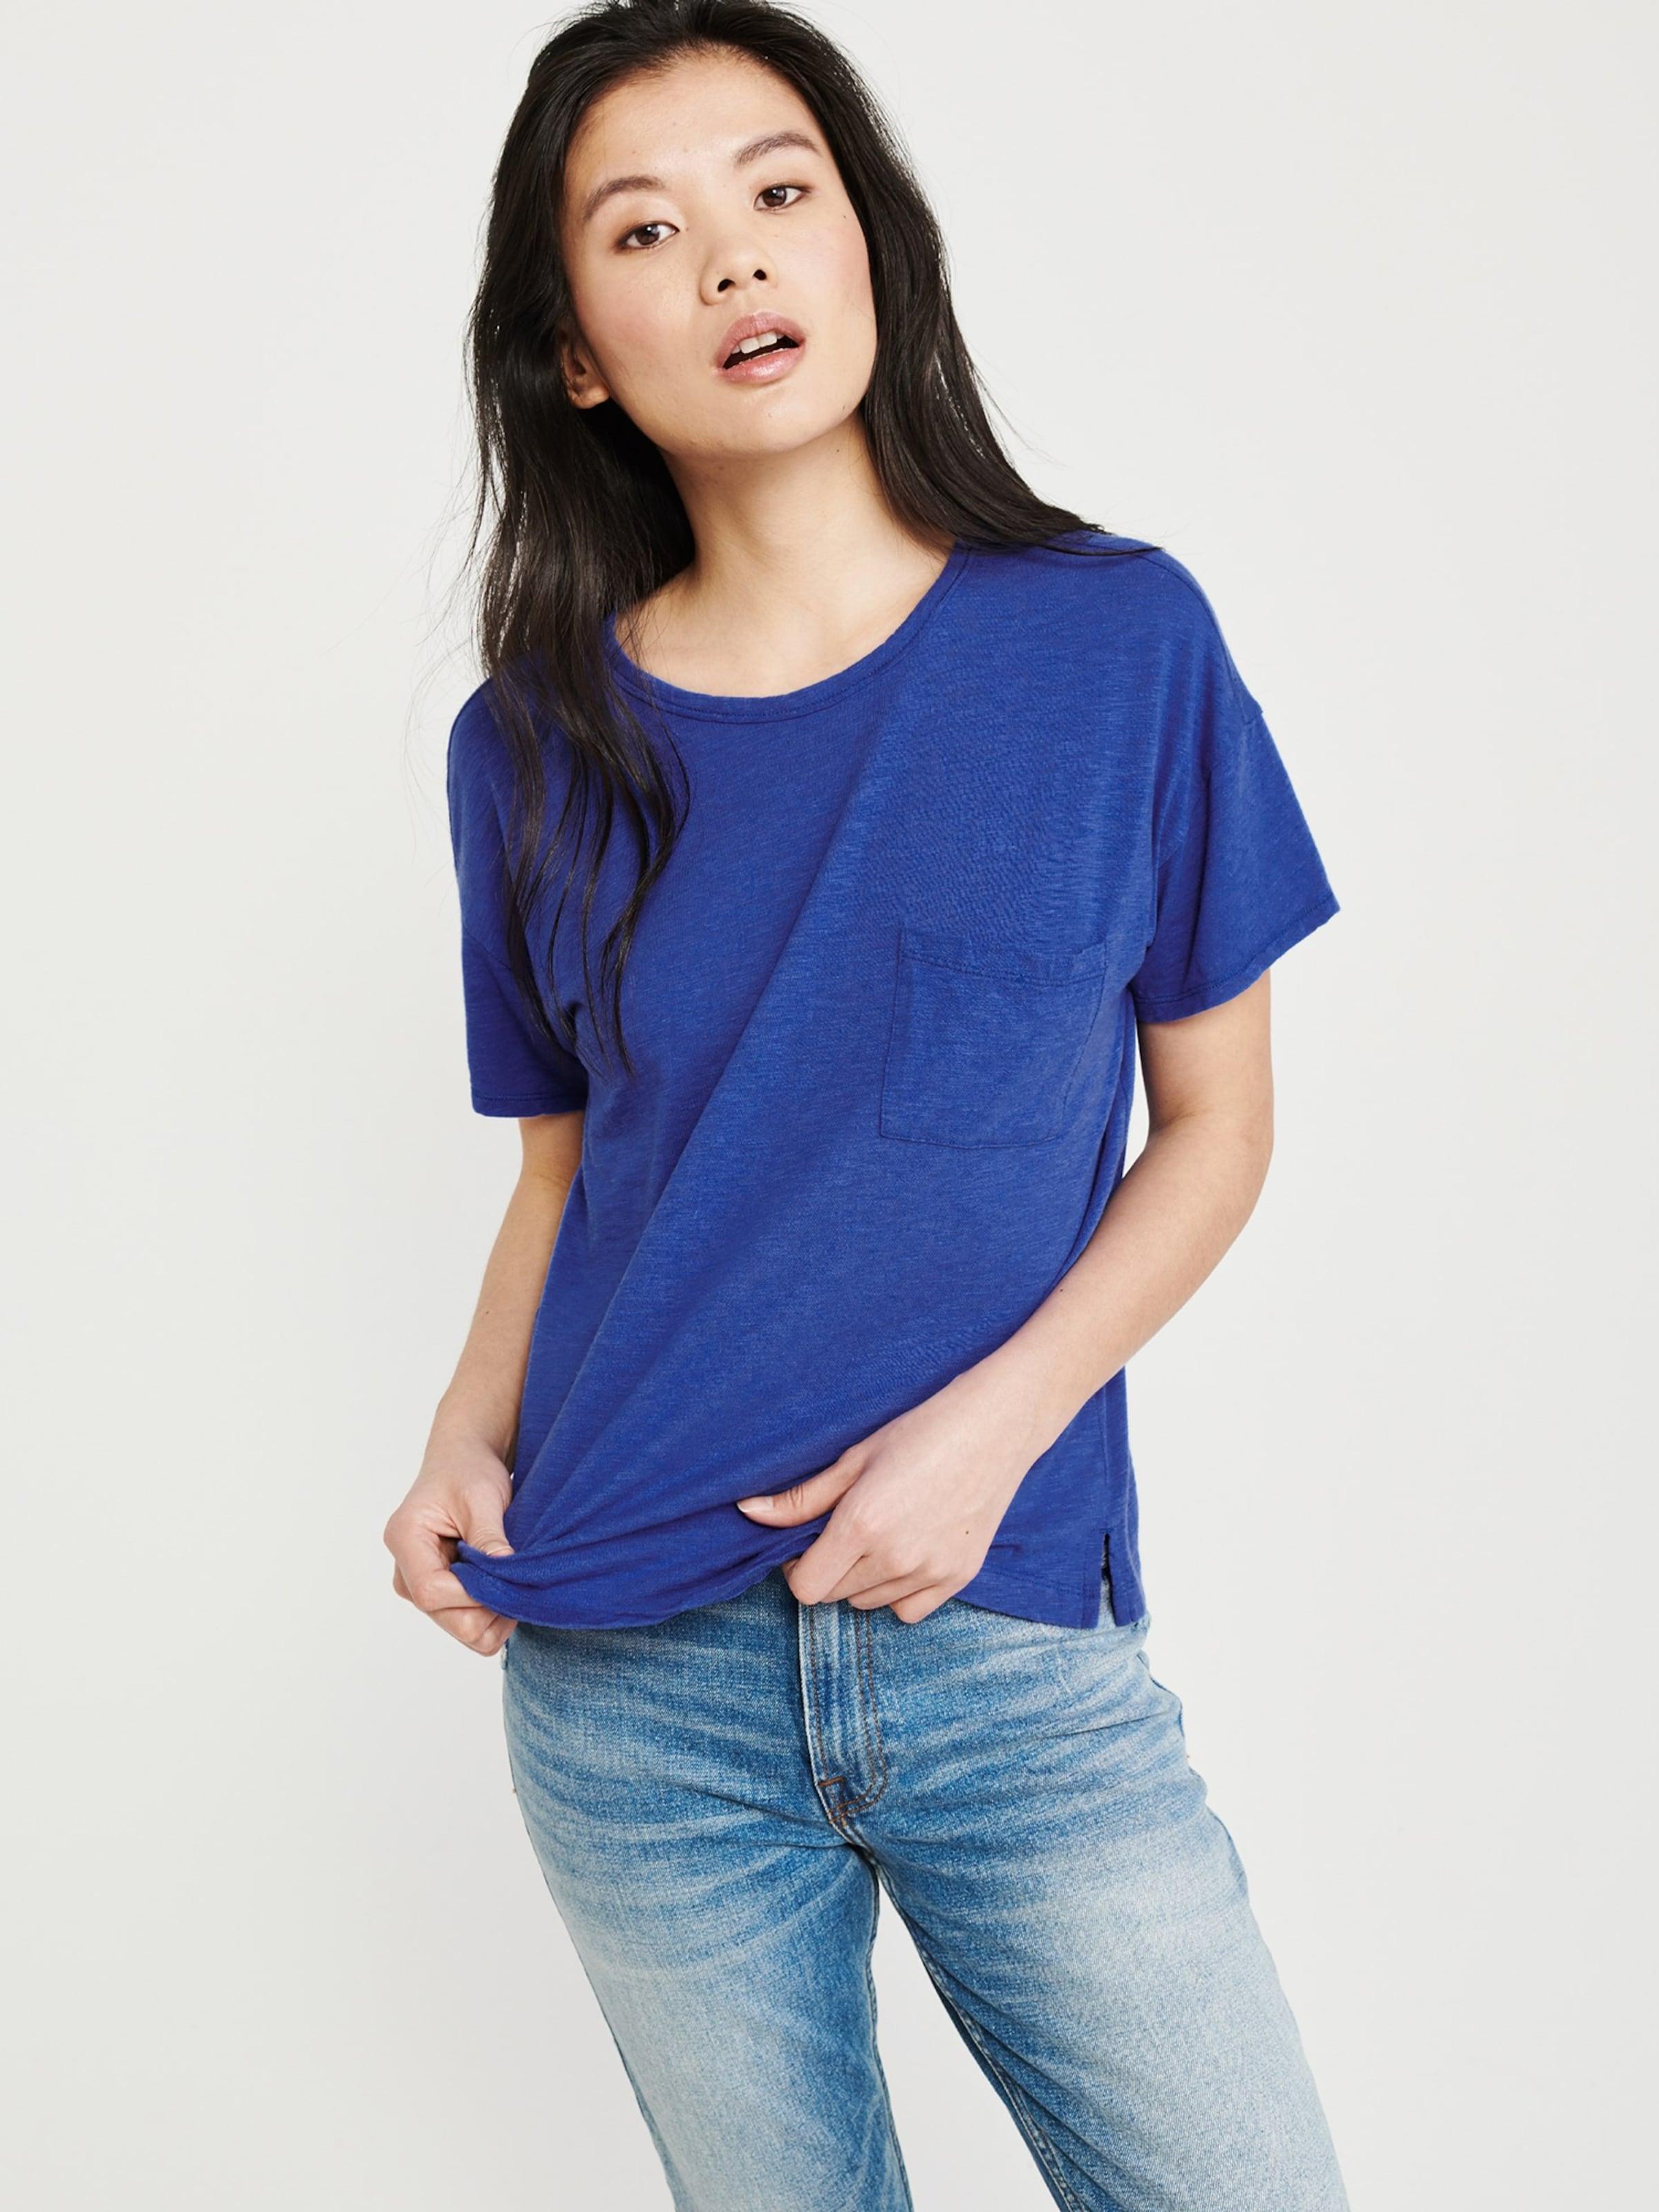 Abercrombieamp; Fitch 'sb19 ss Shirt Shoulder Drop Cobalt' Tee Blau In H2I9WEDbYe